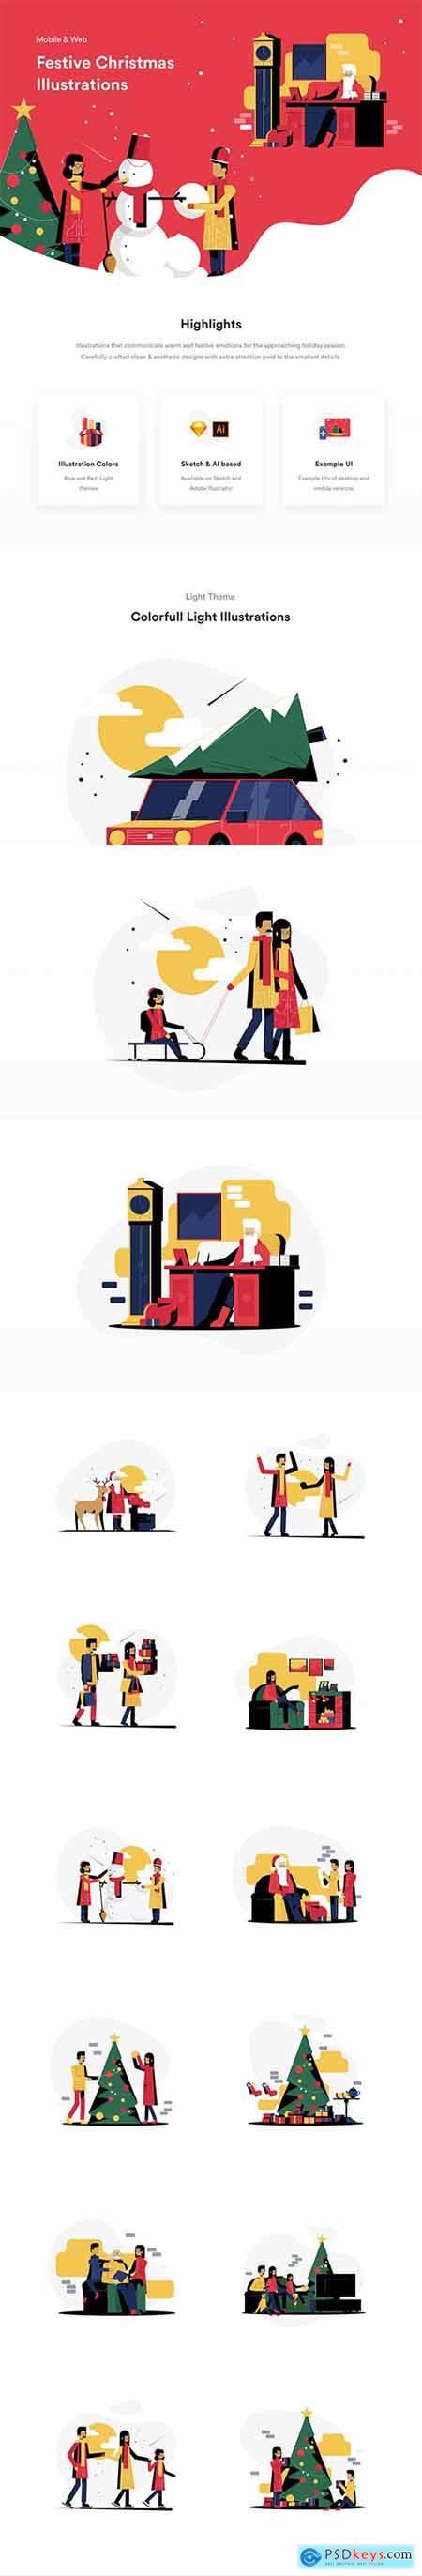 Festive Christmas Illustrations